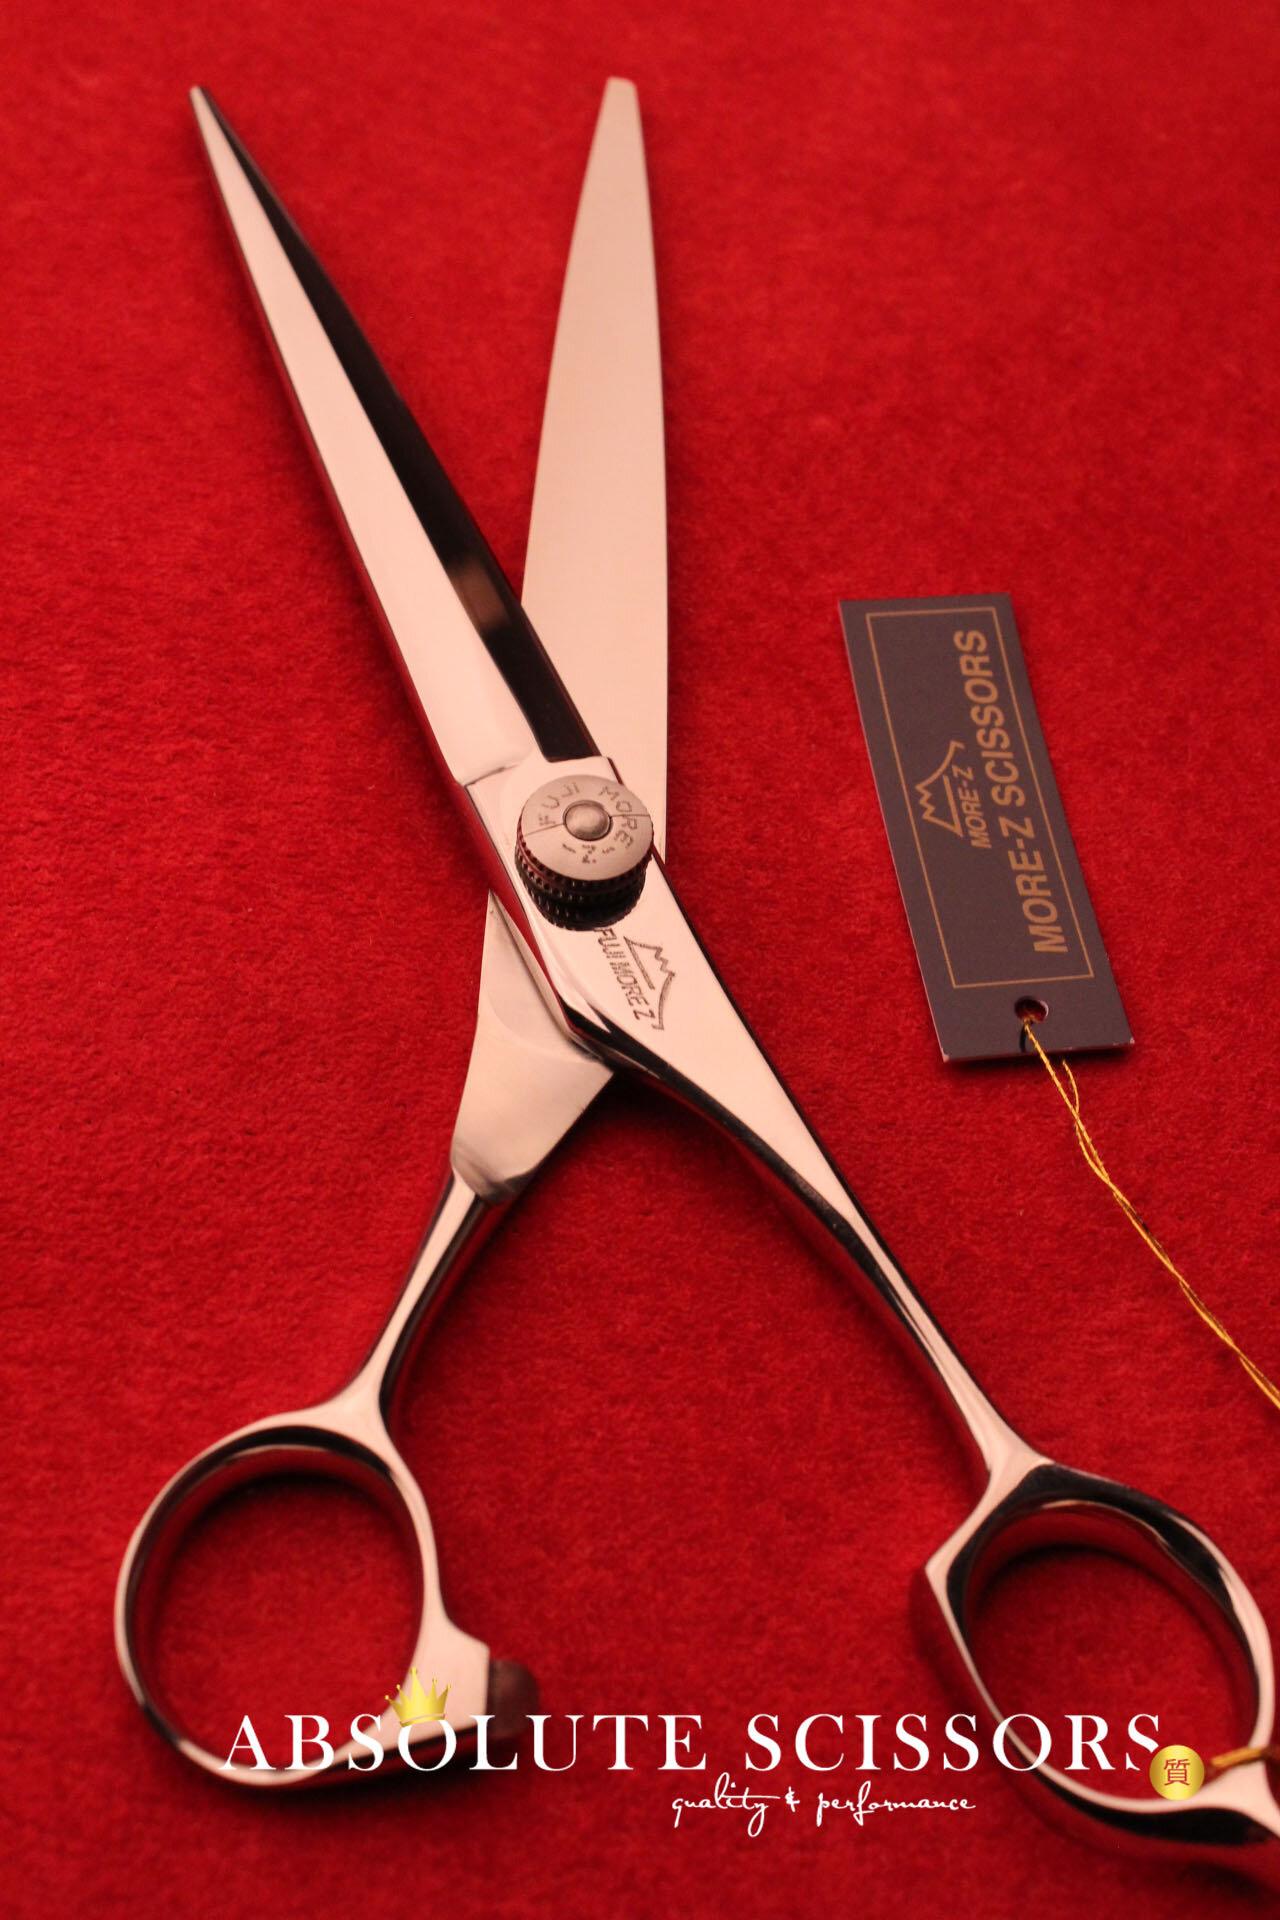 DXGF75 3833 Fuji hair scissors size 7.5 inches